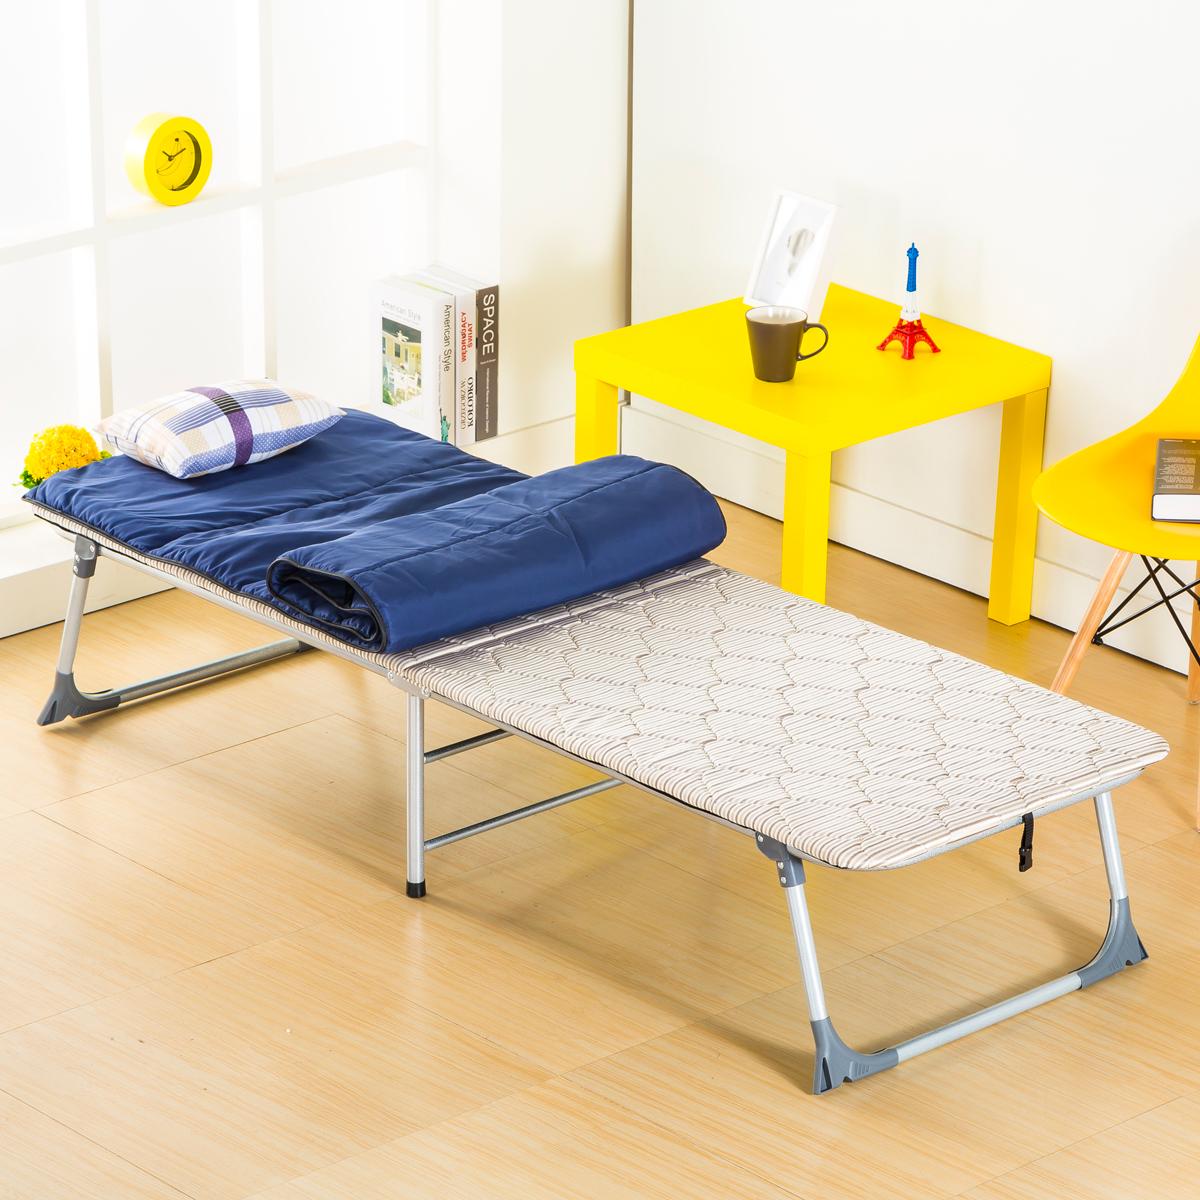 bx折叠床BX5200